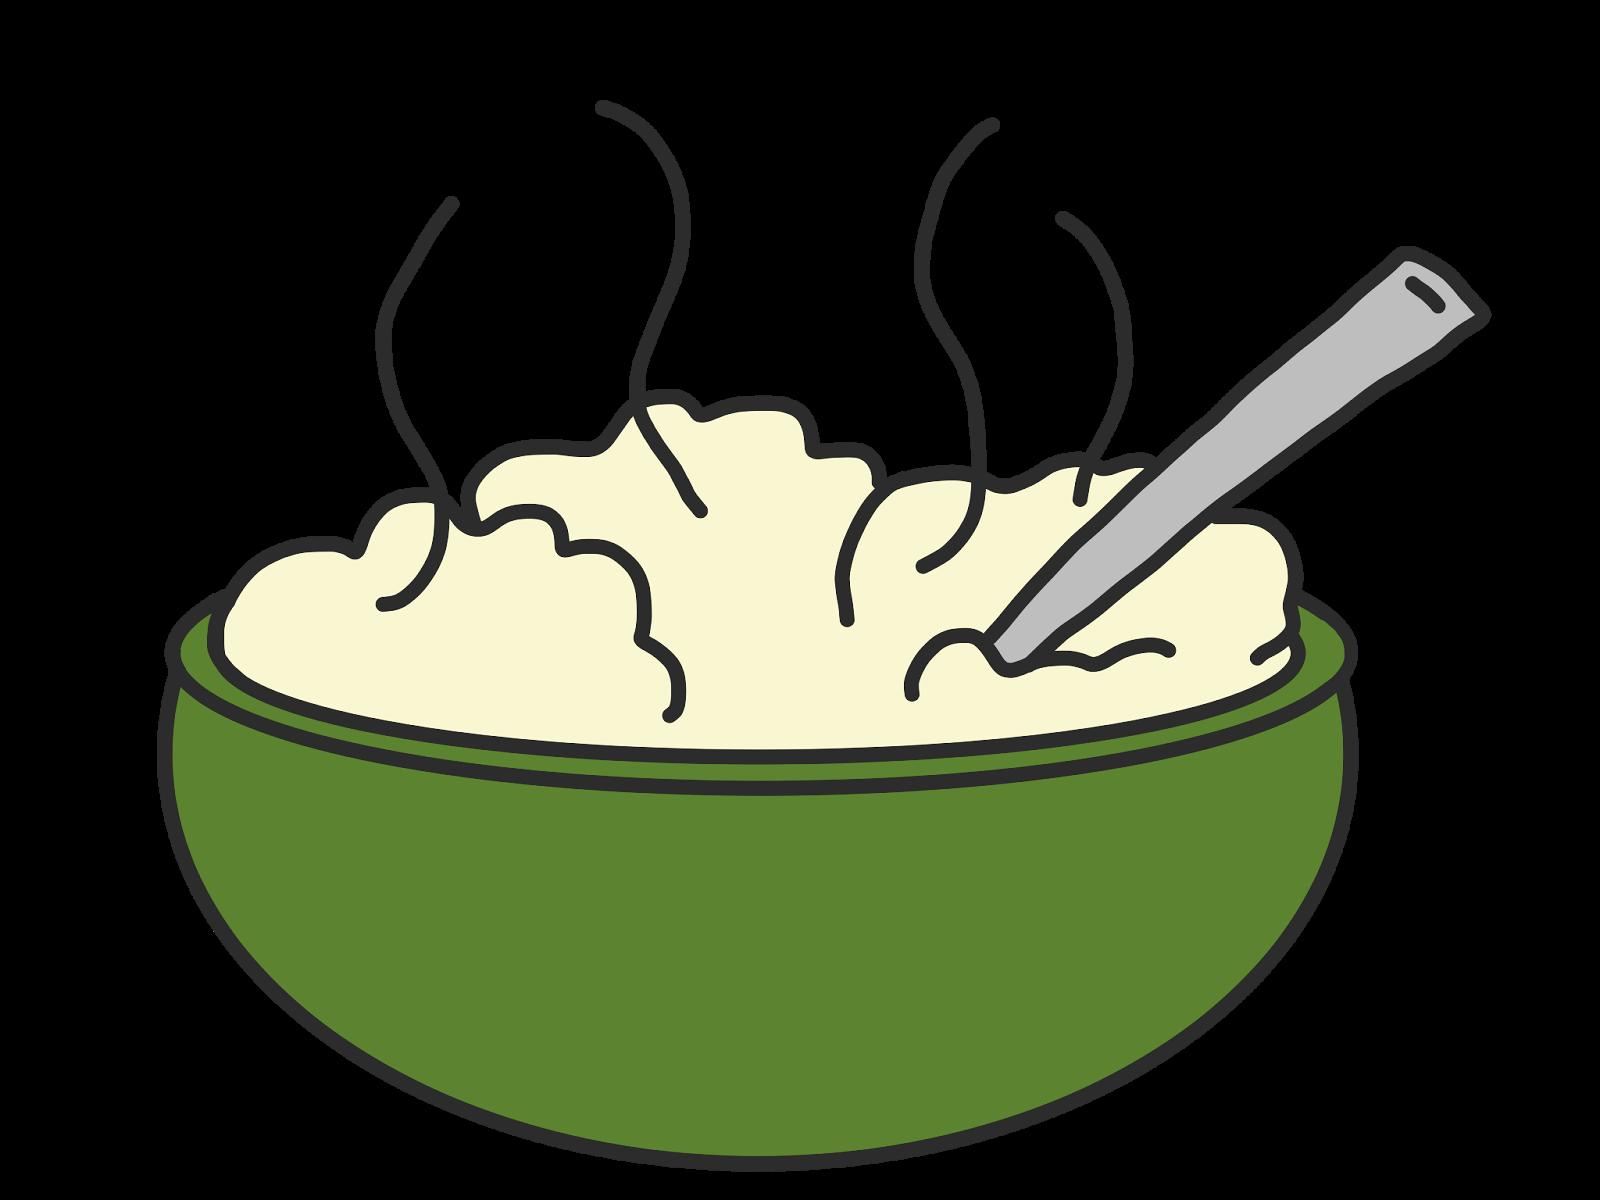 Linking up and answering. Potato clipart mash potato